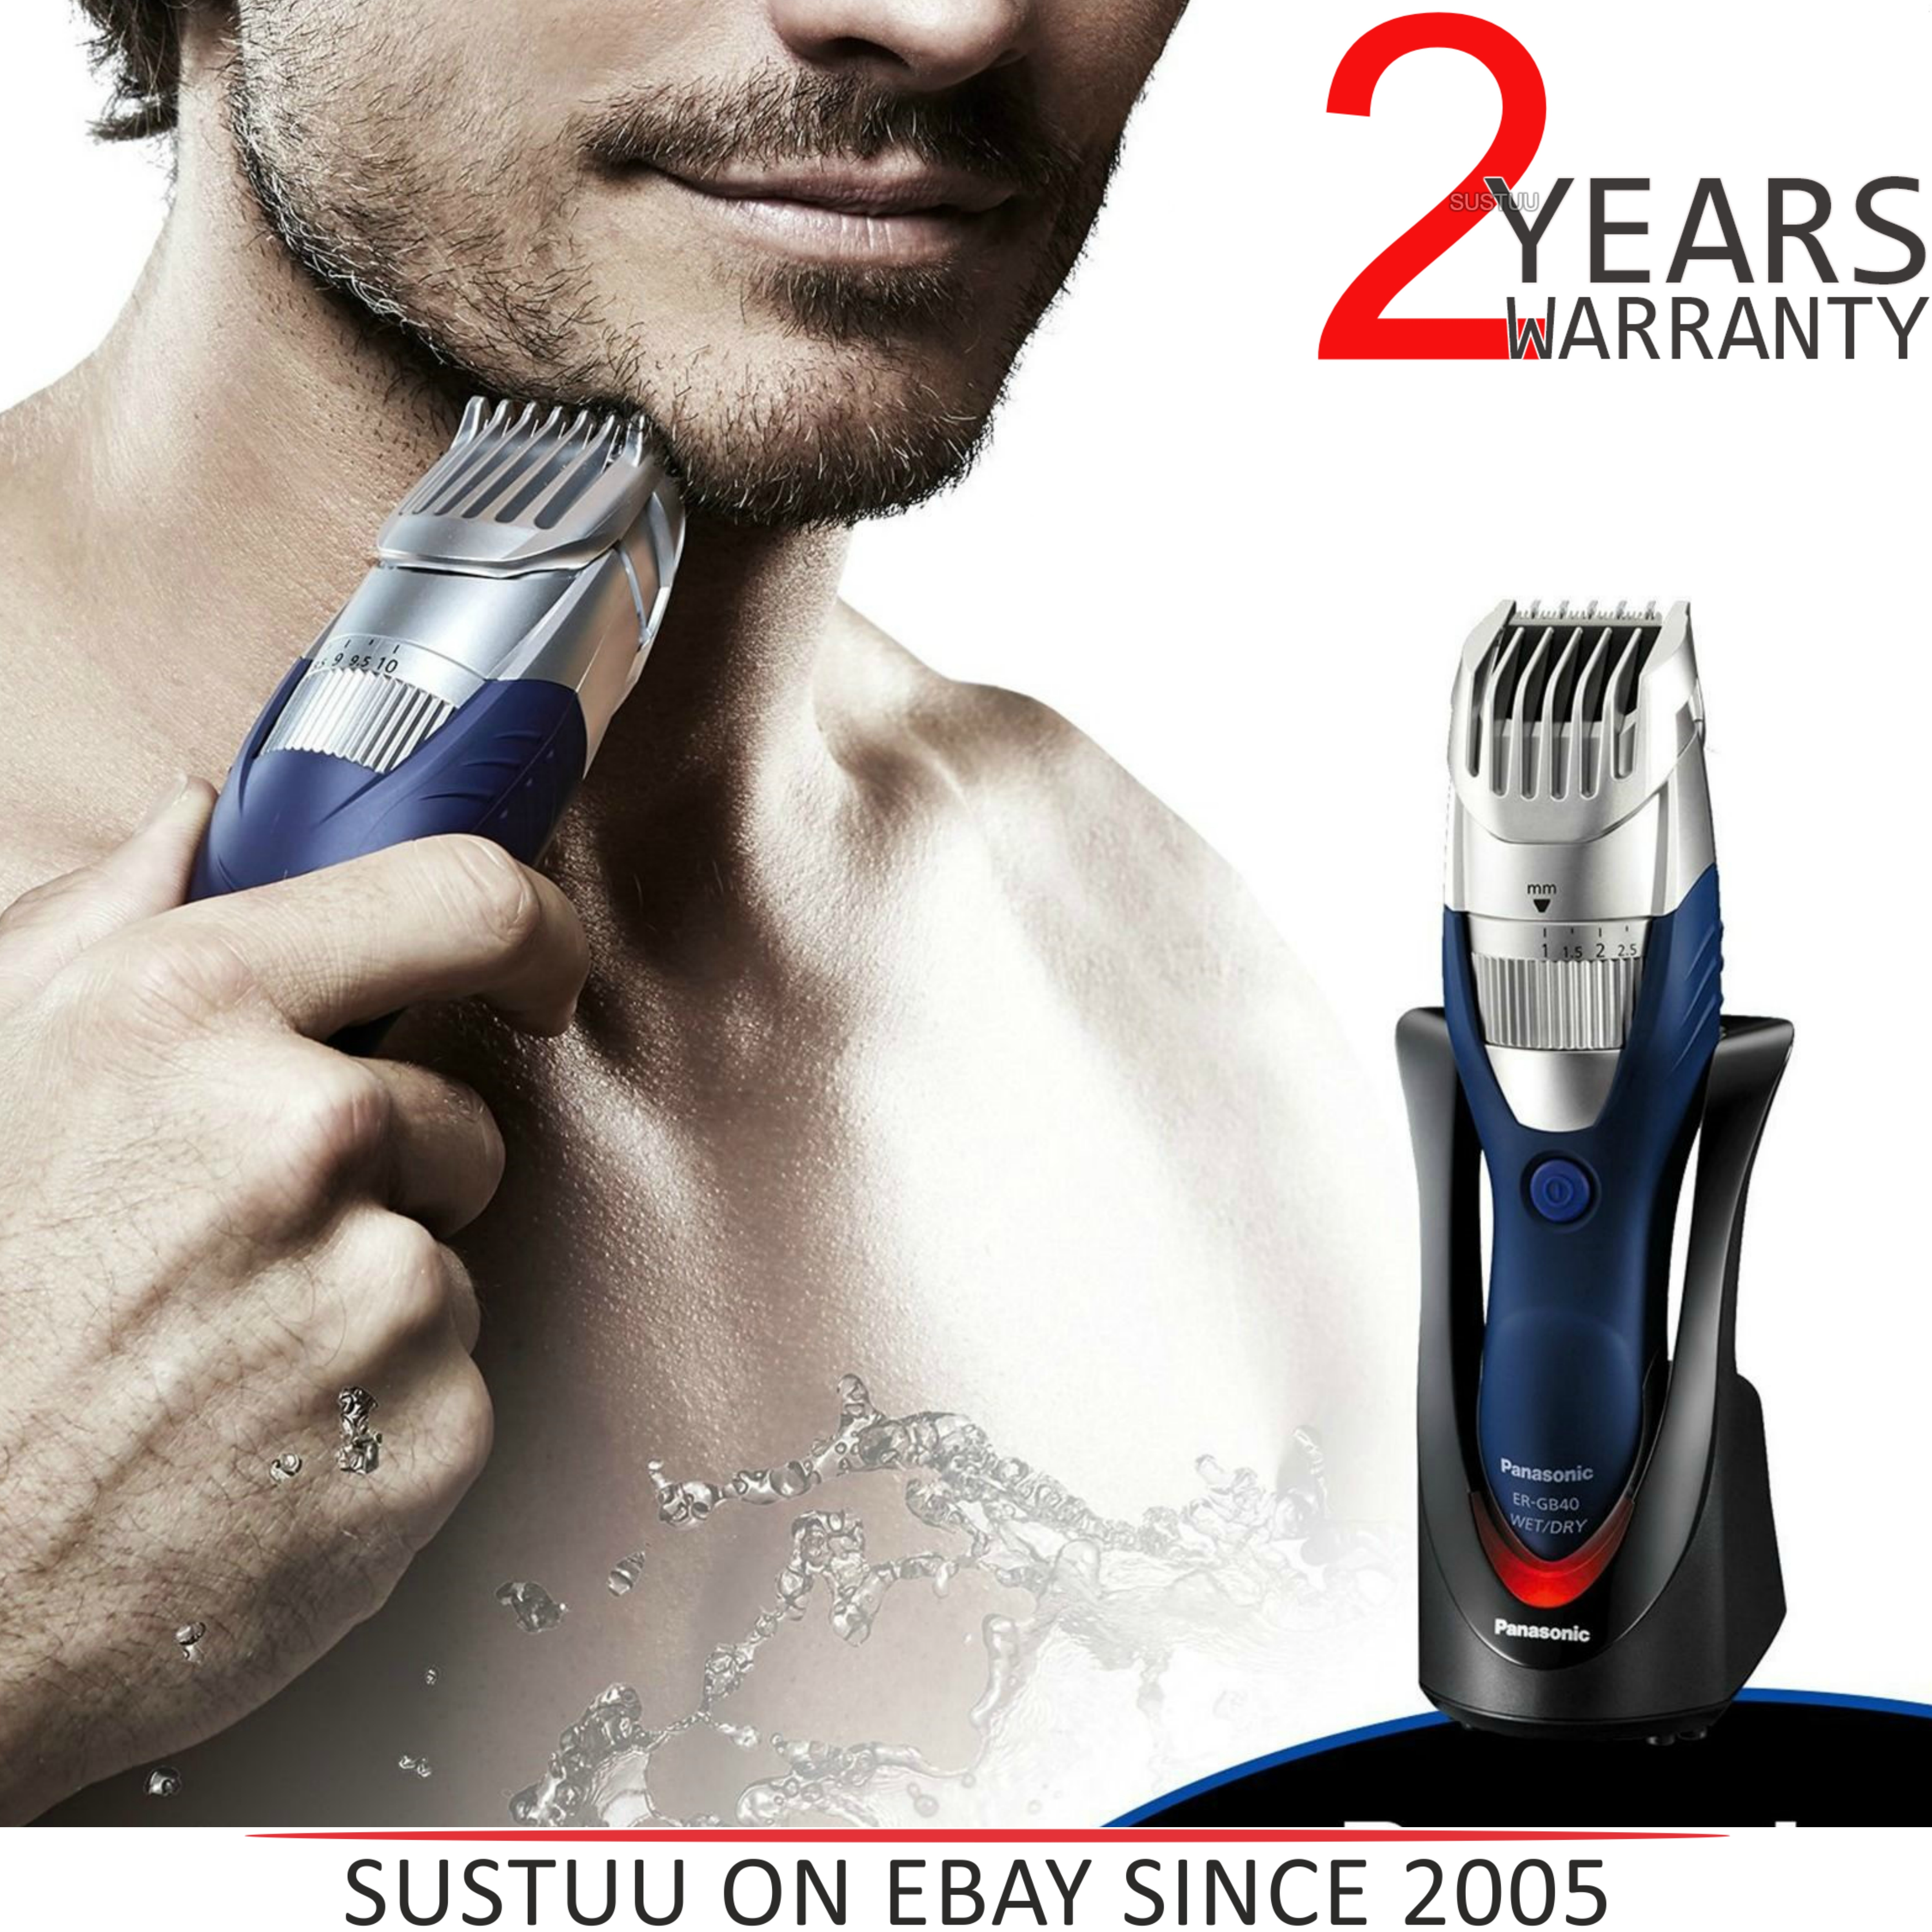 Panasonic ERGB40S?Wet/Dry?Washable?Men's Hair Beared Cordless Clipper Trimmer?